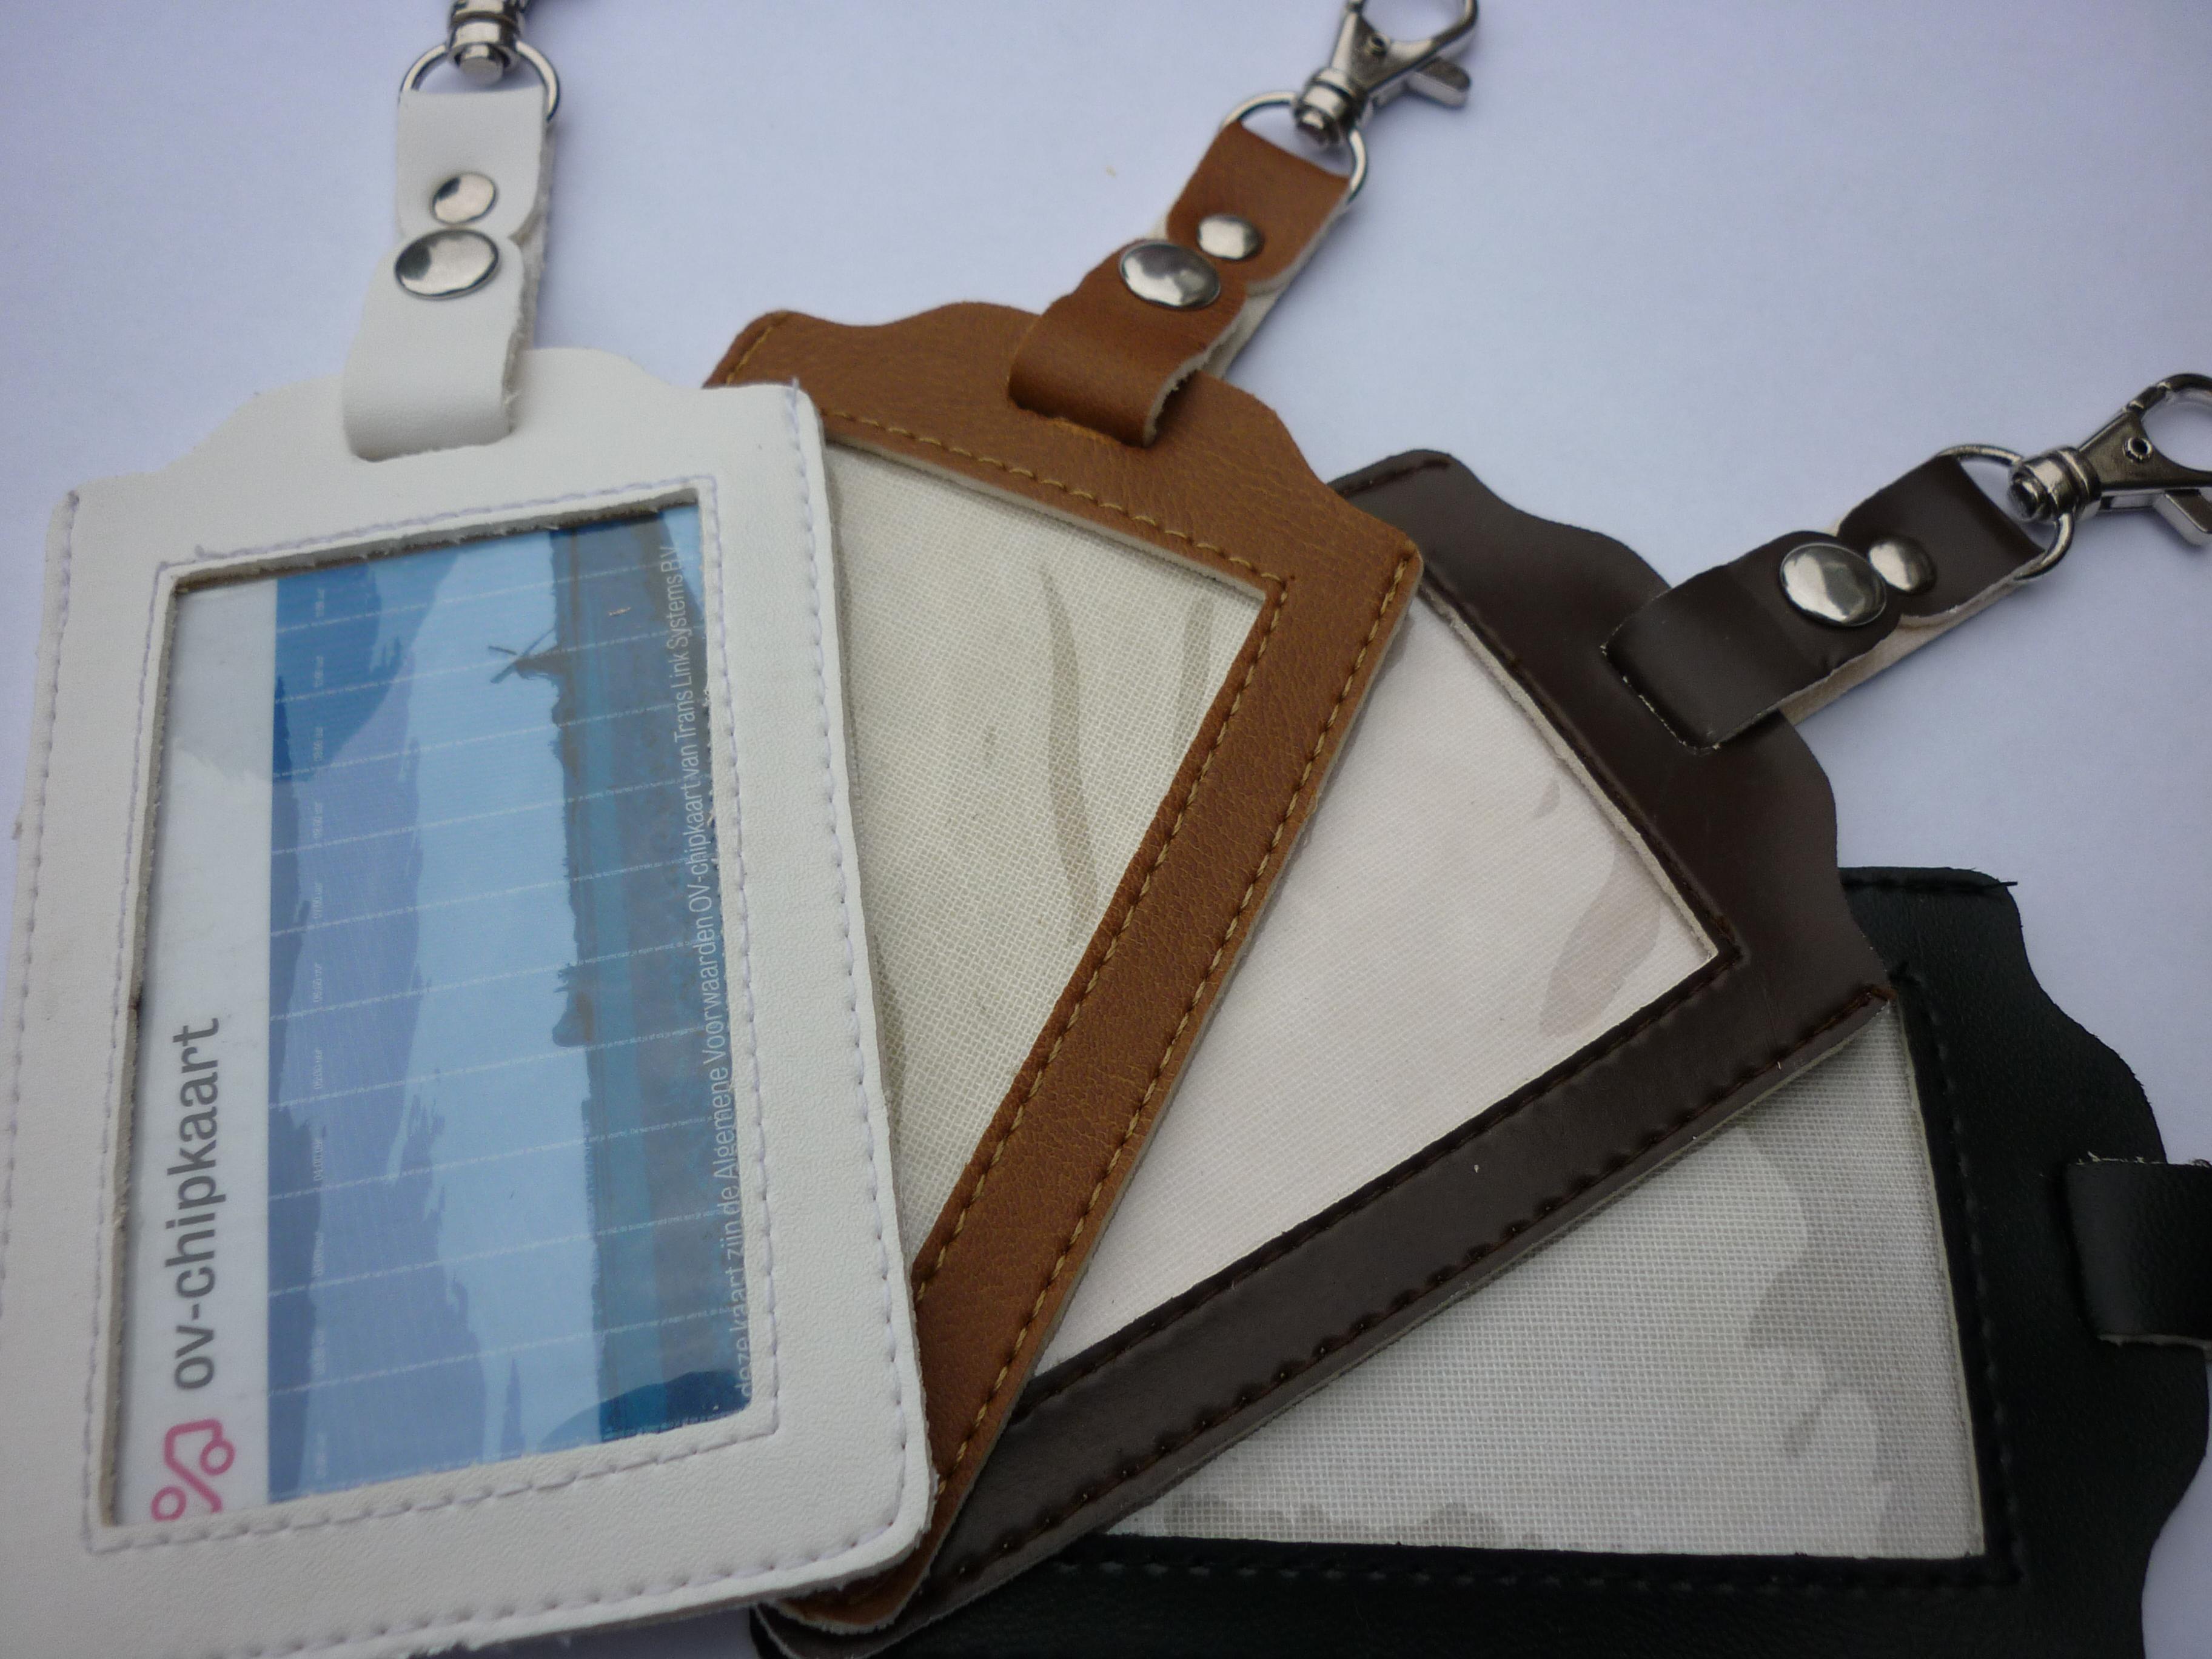 65971c2bfd8 OV chipkaart hoesje met jojo Accessories OVshop.nl OV chipkaart hoesje  transparant OV chipkaart kopen OV chipkaart hoesje met luxe keycord OV  Accessoires ...